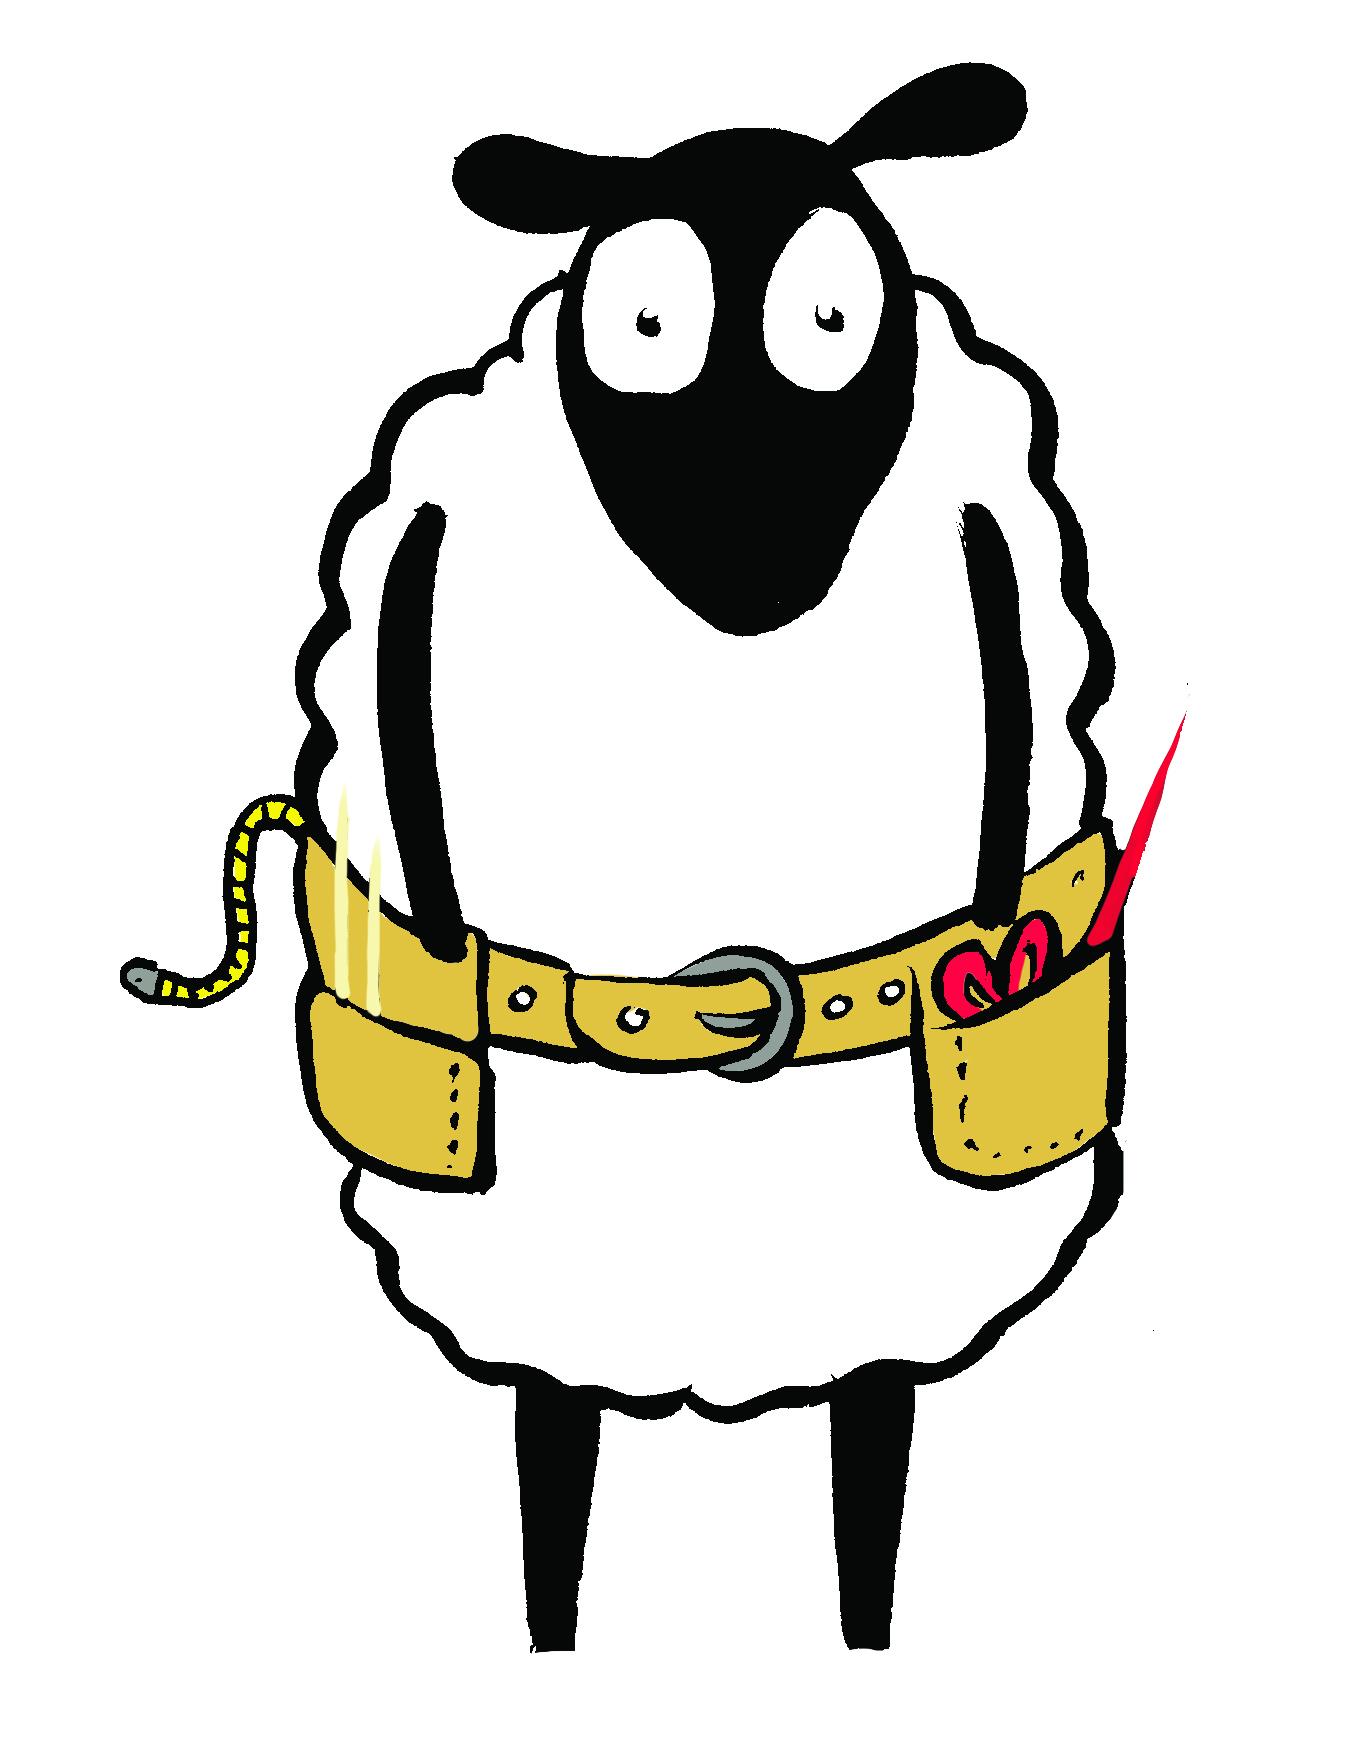 Sheep with Tools.jpg